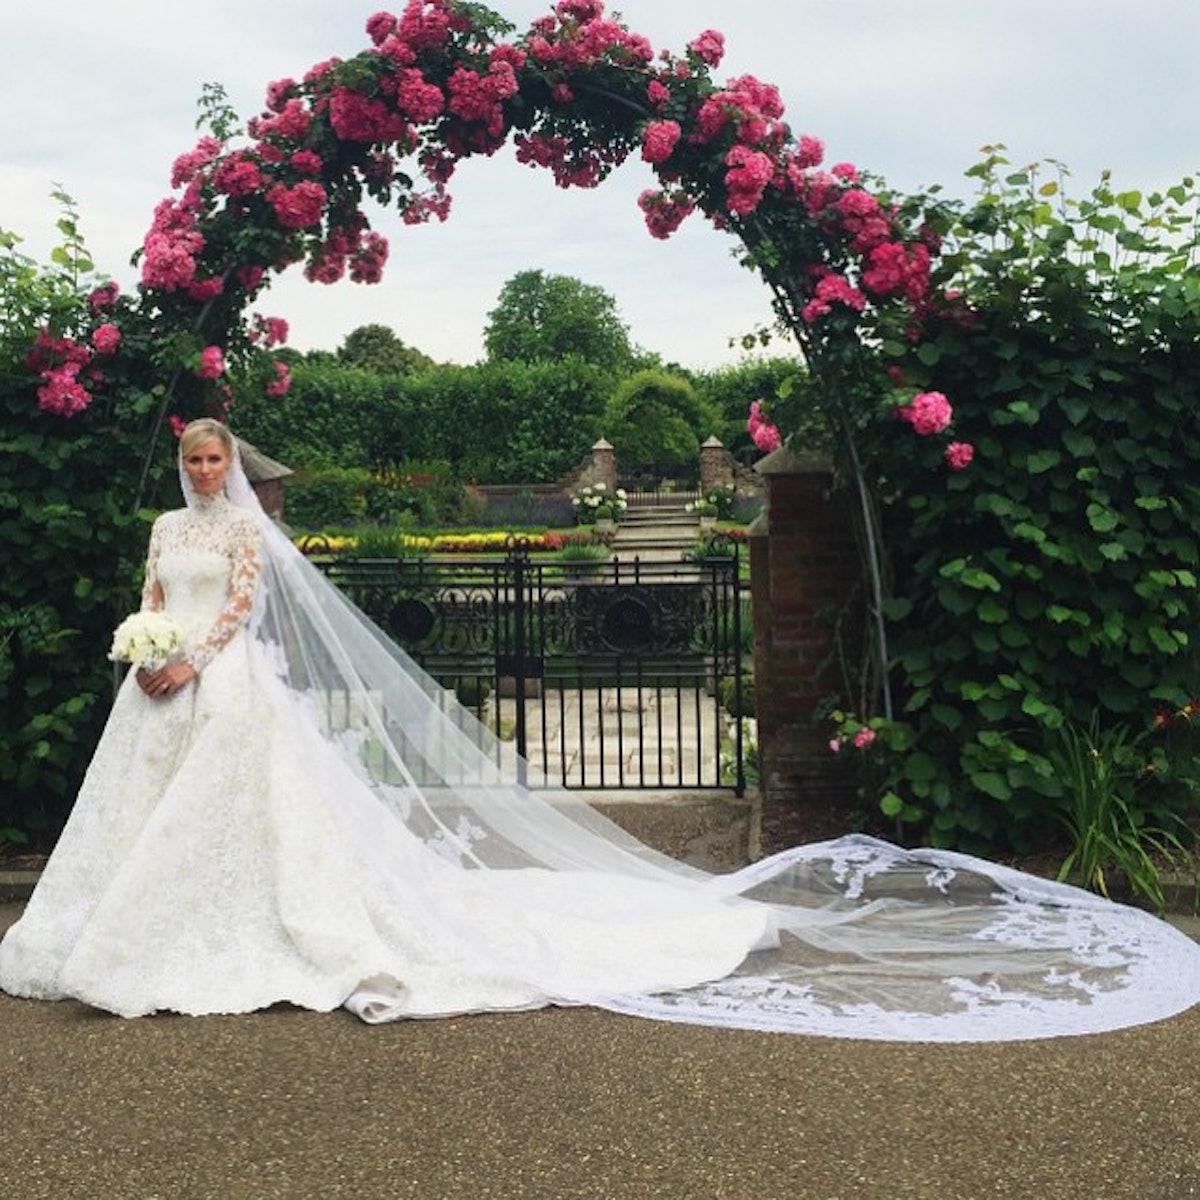 nicky-hilton-wedding